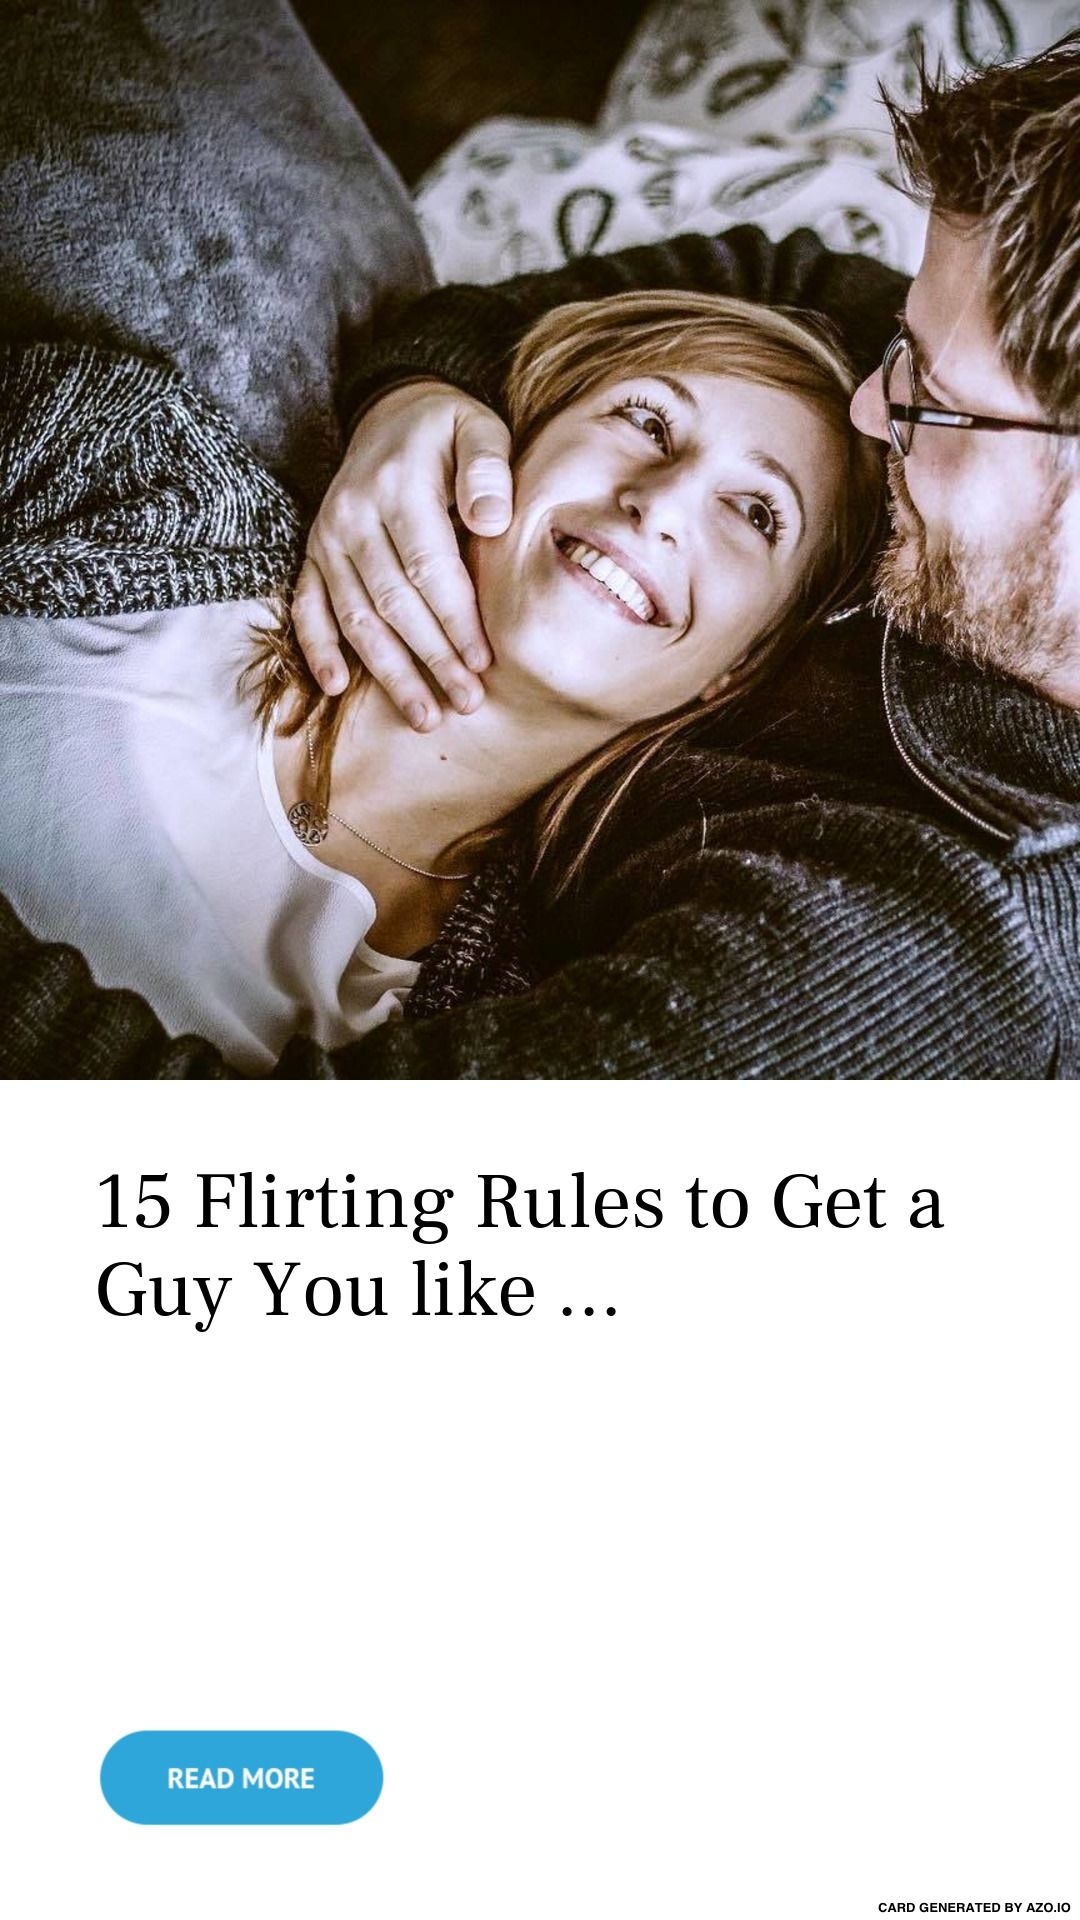 15 Flirting Rules to Get a Guy You like  | Flirting